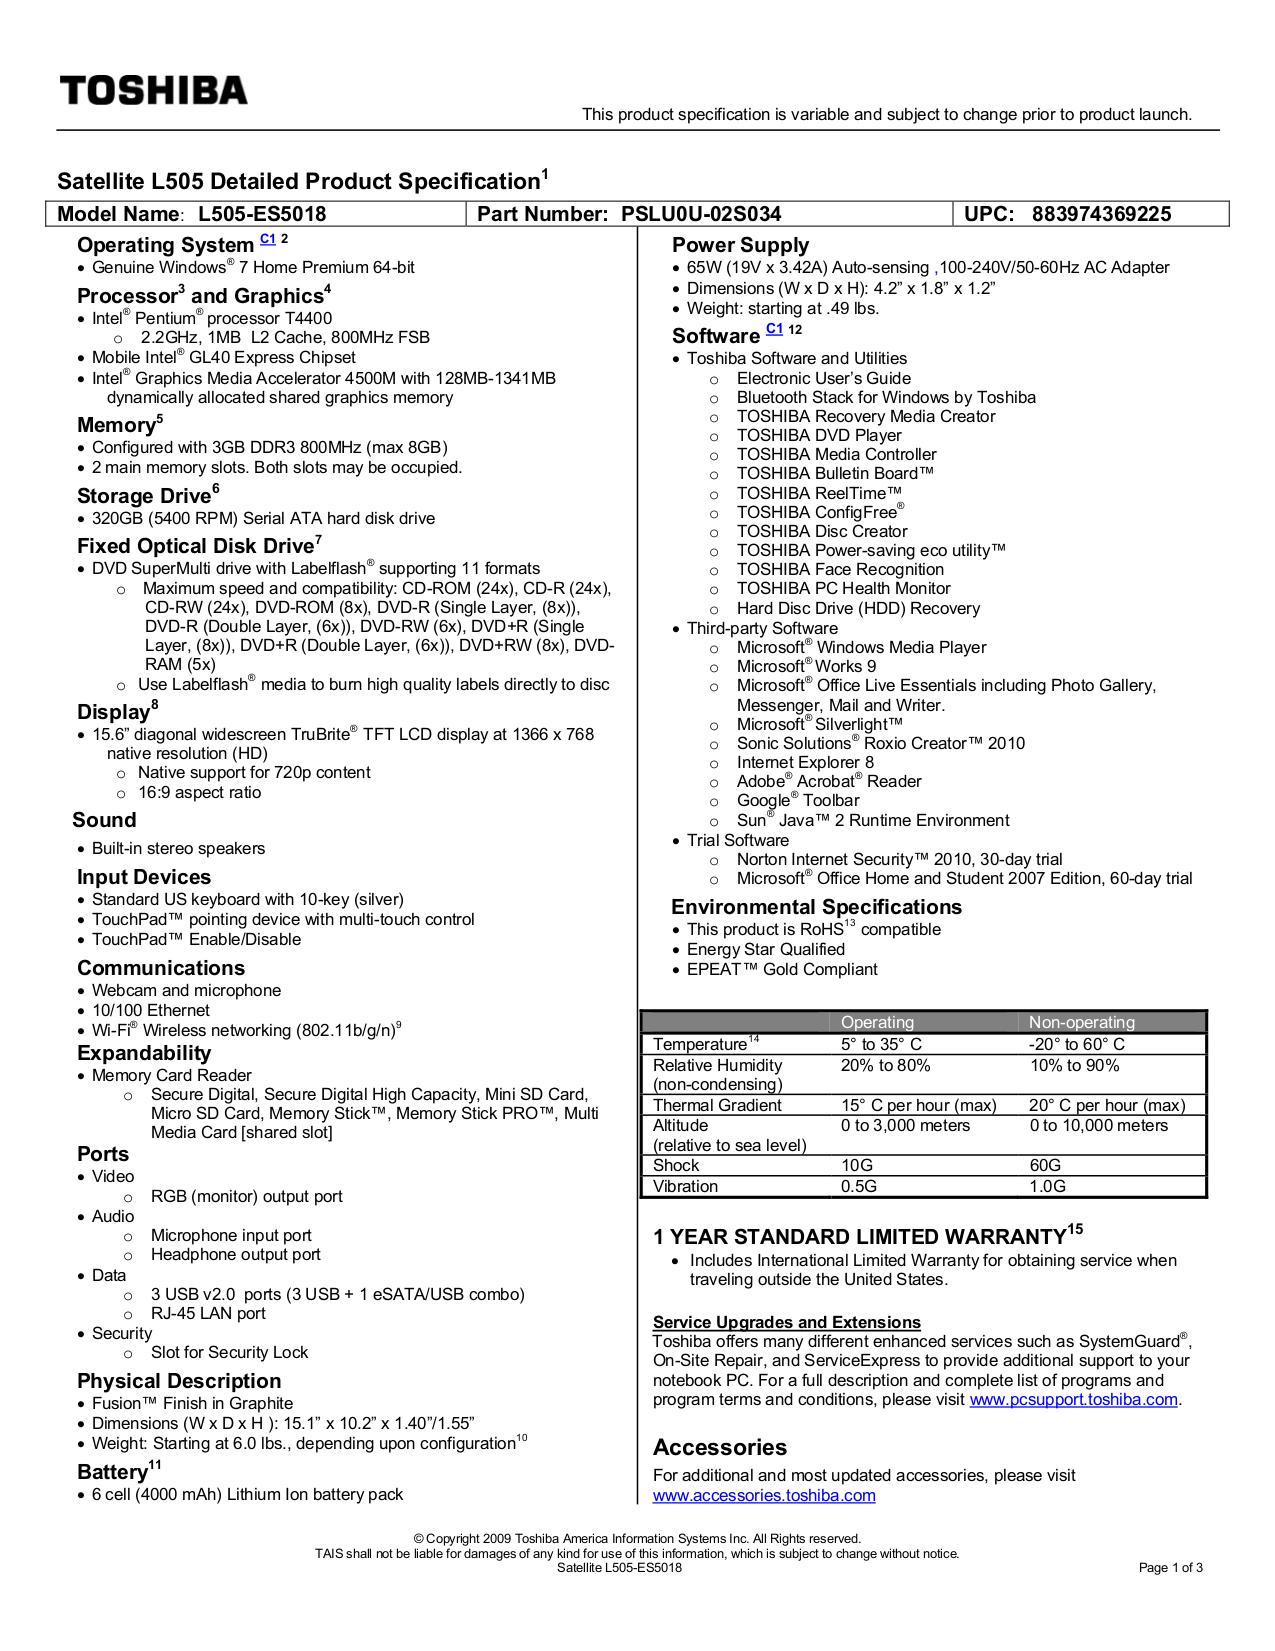 download free pdf for toshiba satellite l505 es5018 laptop manual rh umlib com Toshiba Satellite L505D-LS5001 Charger toshiba satellite l505 manual